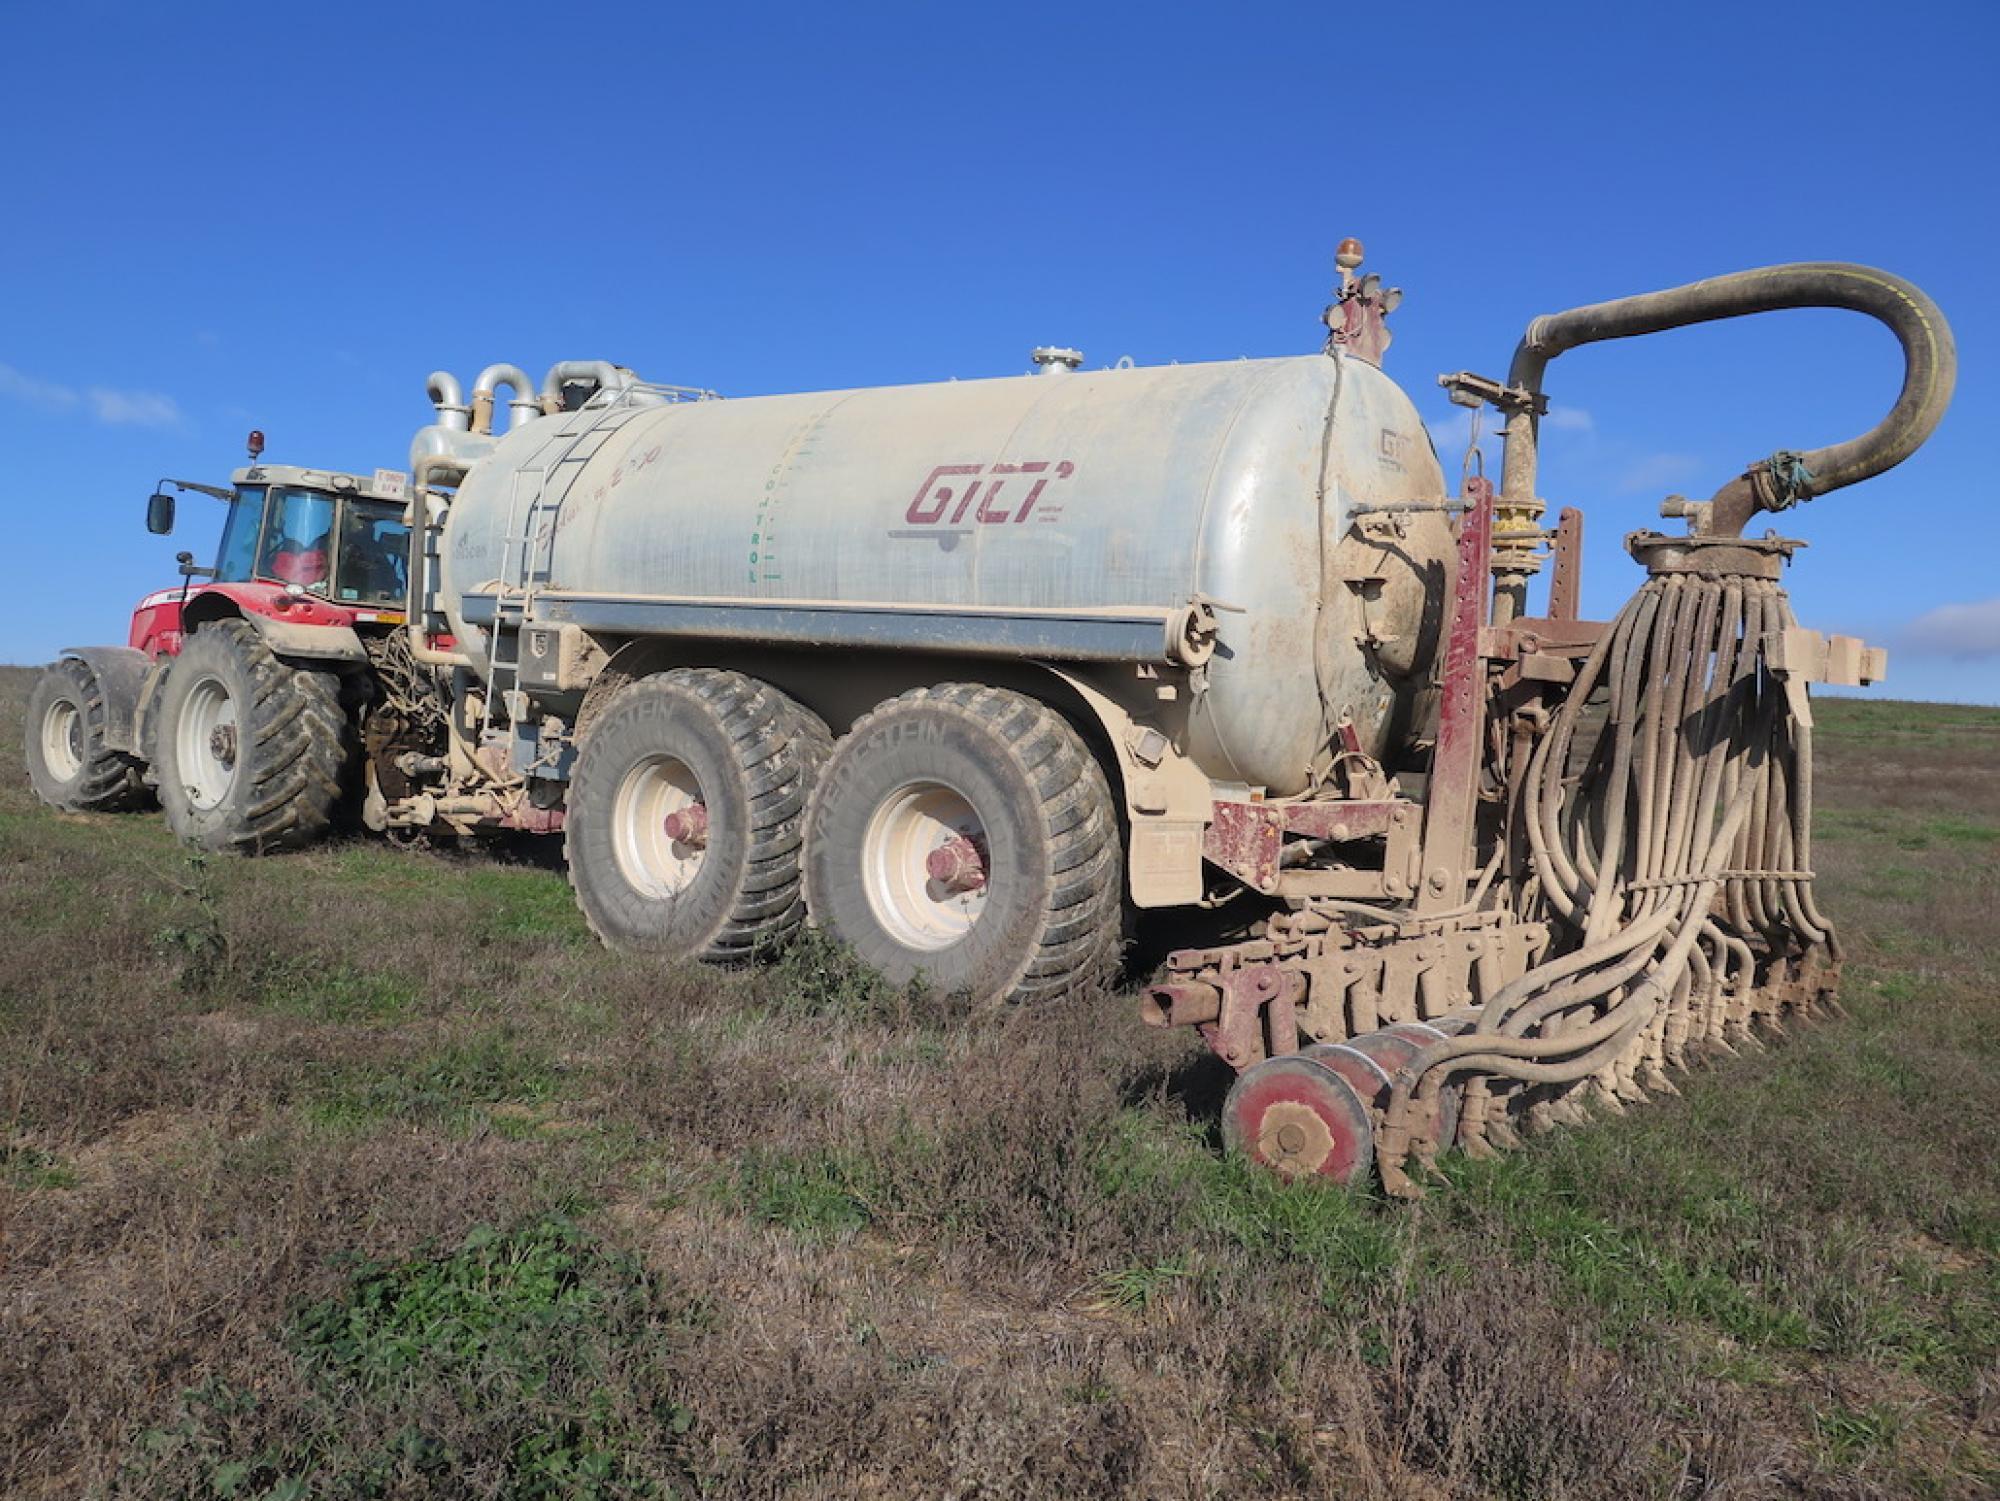 ITV maquinària agrícola a Argençola i Carbasí